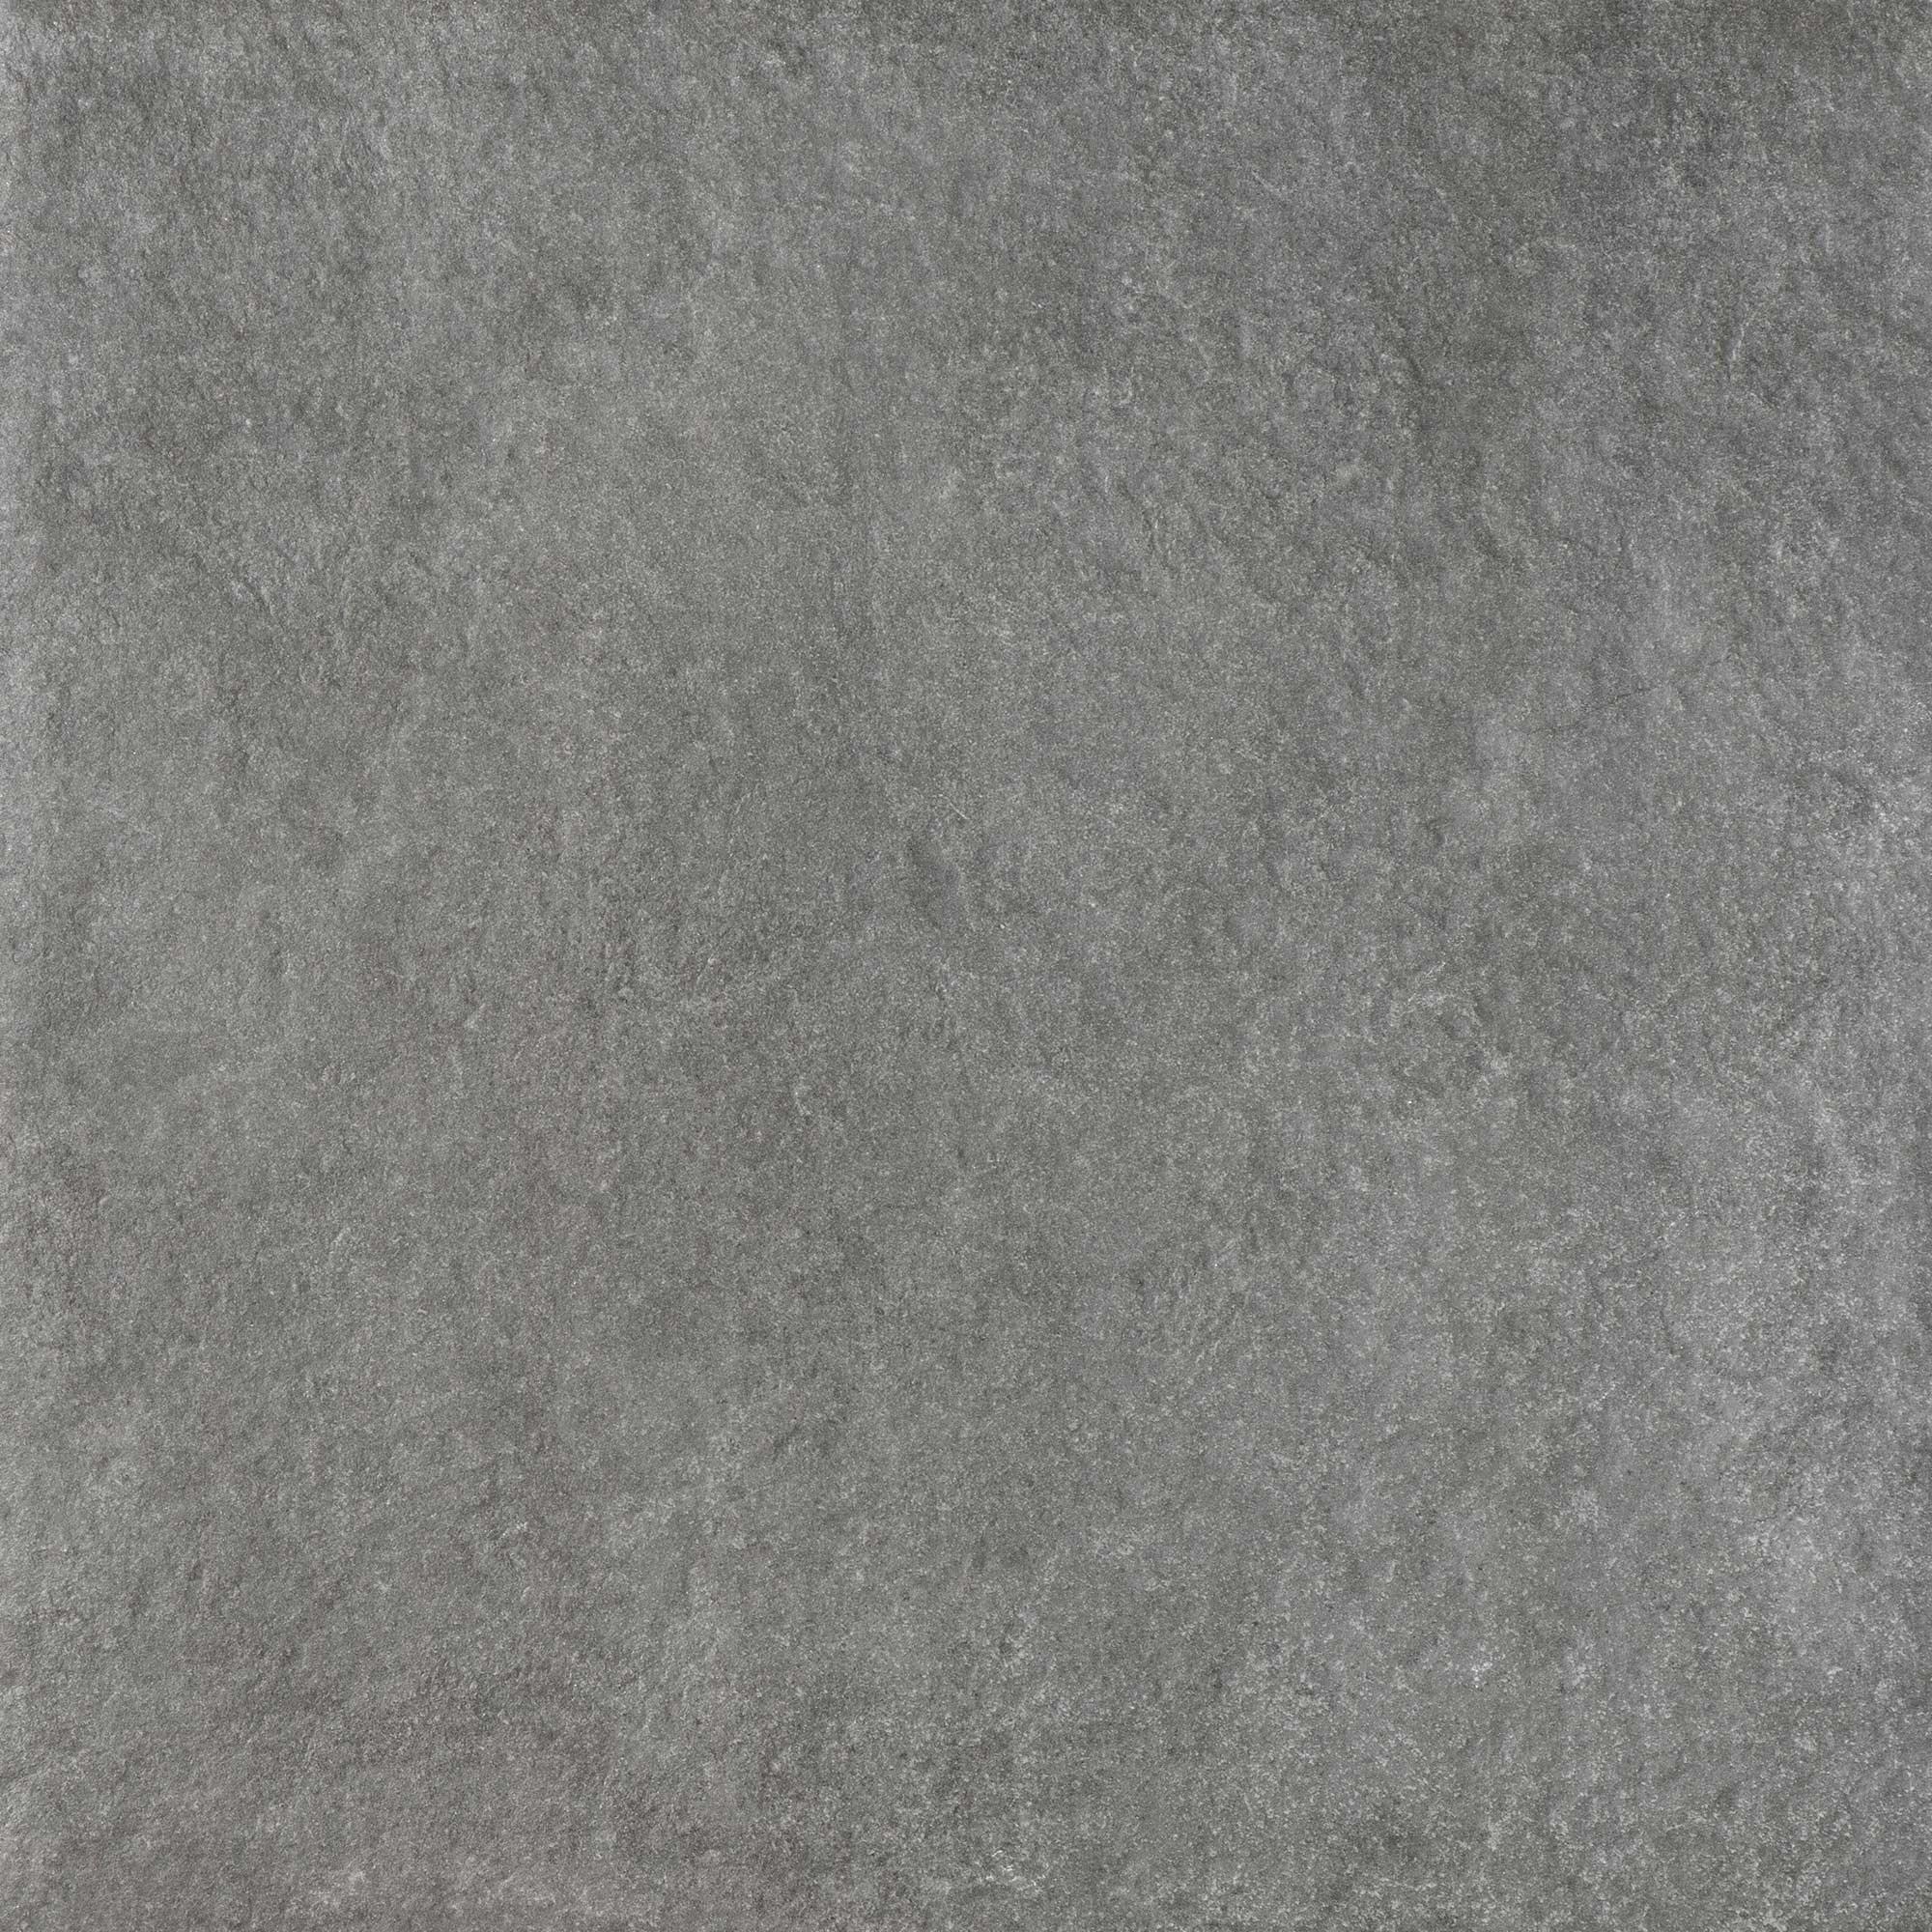 Klinker Bricmate Z Concrete Anthracite  60×60 cm